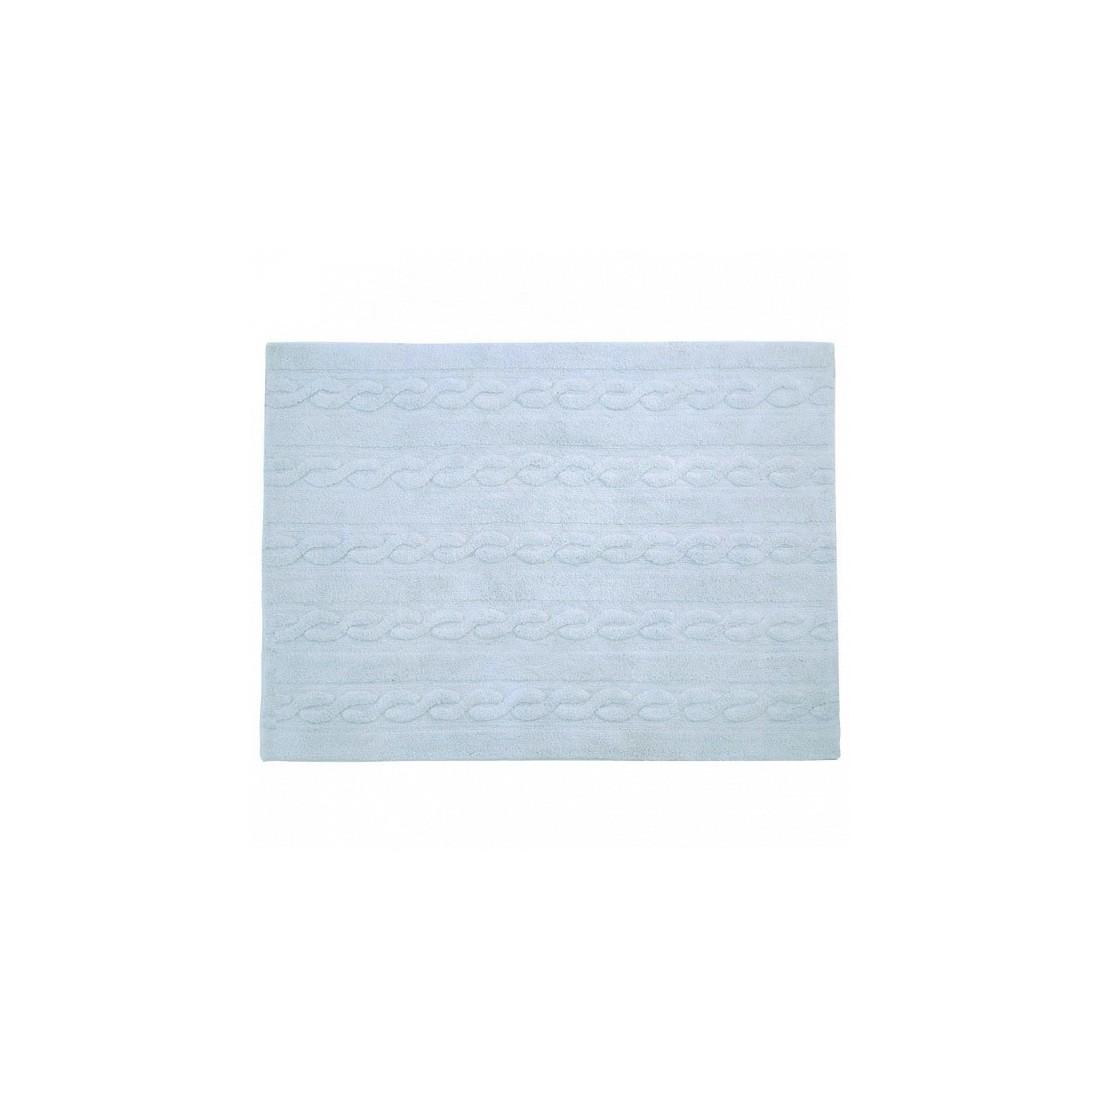 tapis lavable torsades bleu clair lorena canals ma. Black Bedroom Furniture Sets. Home Design Ideas